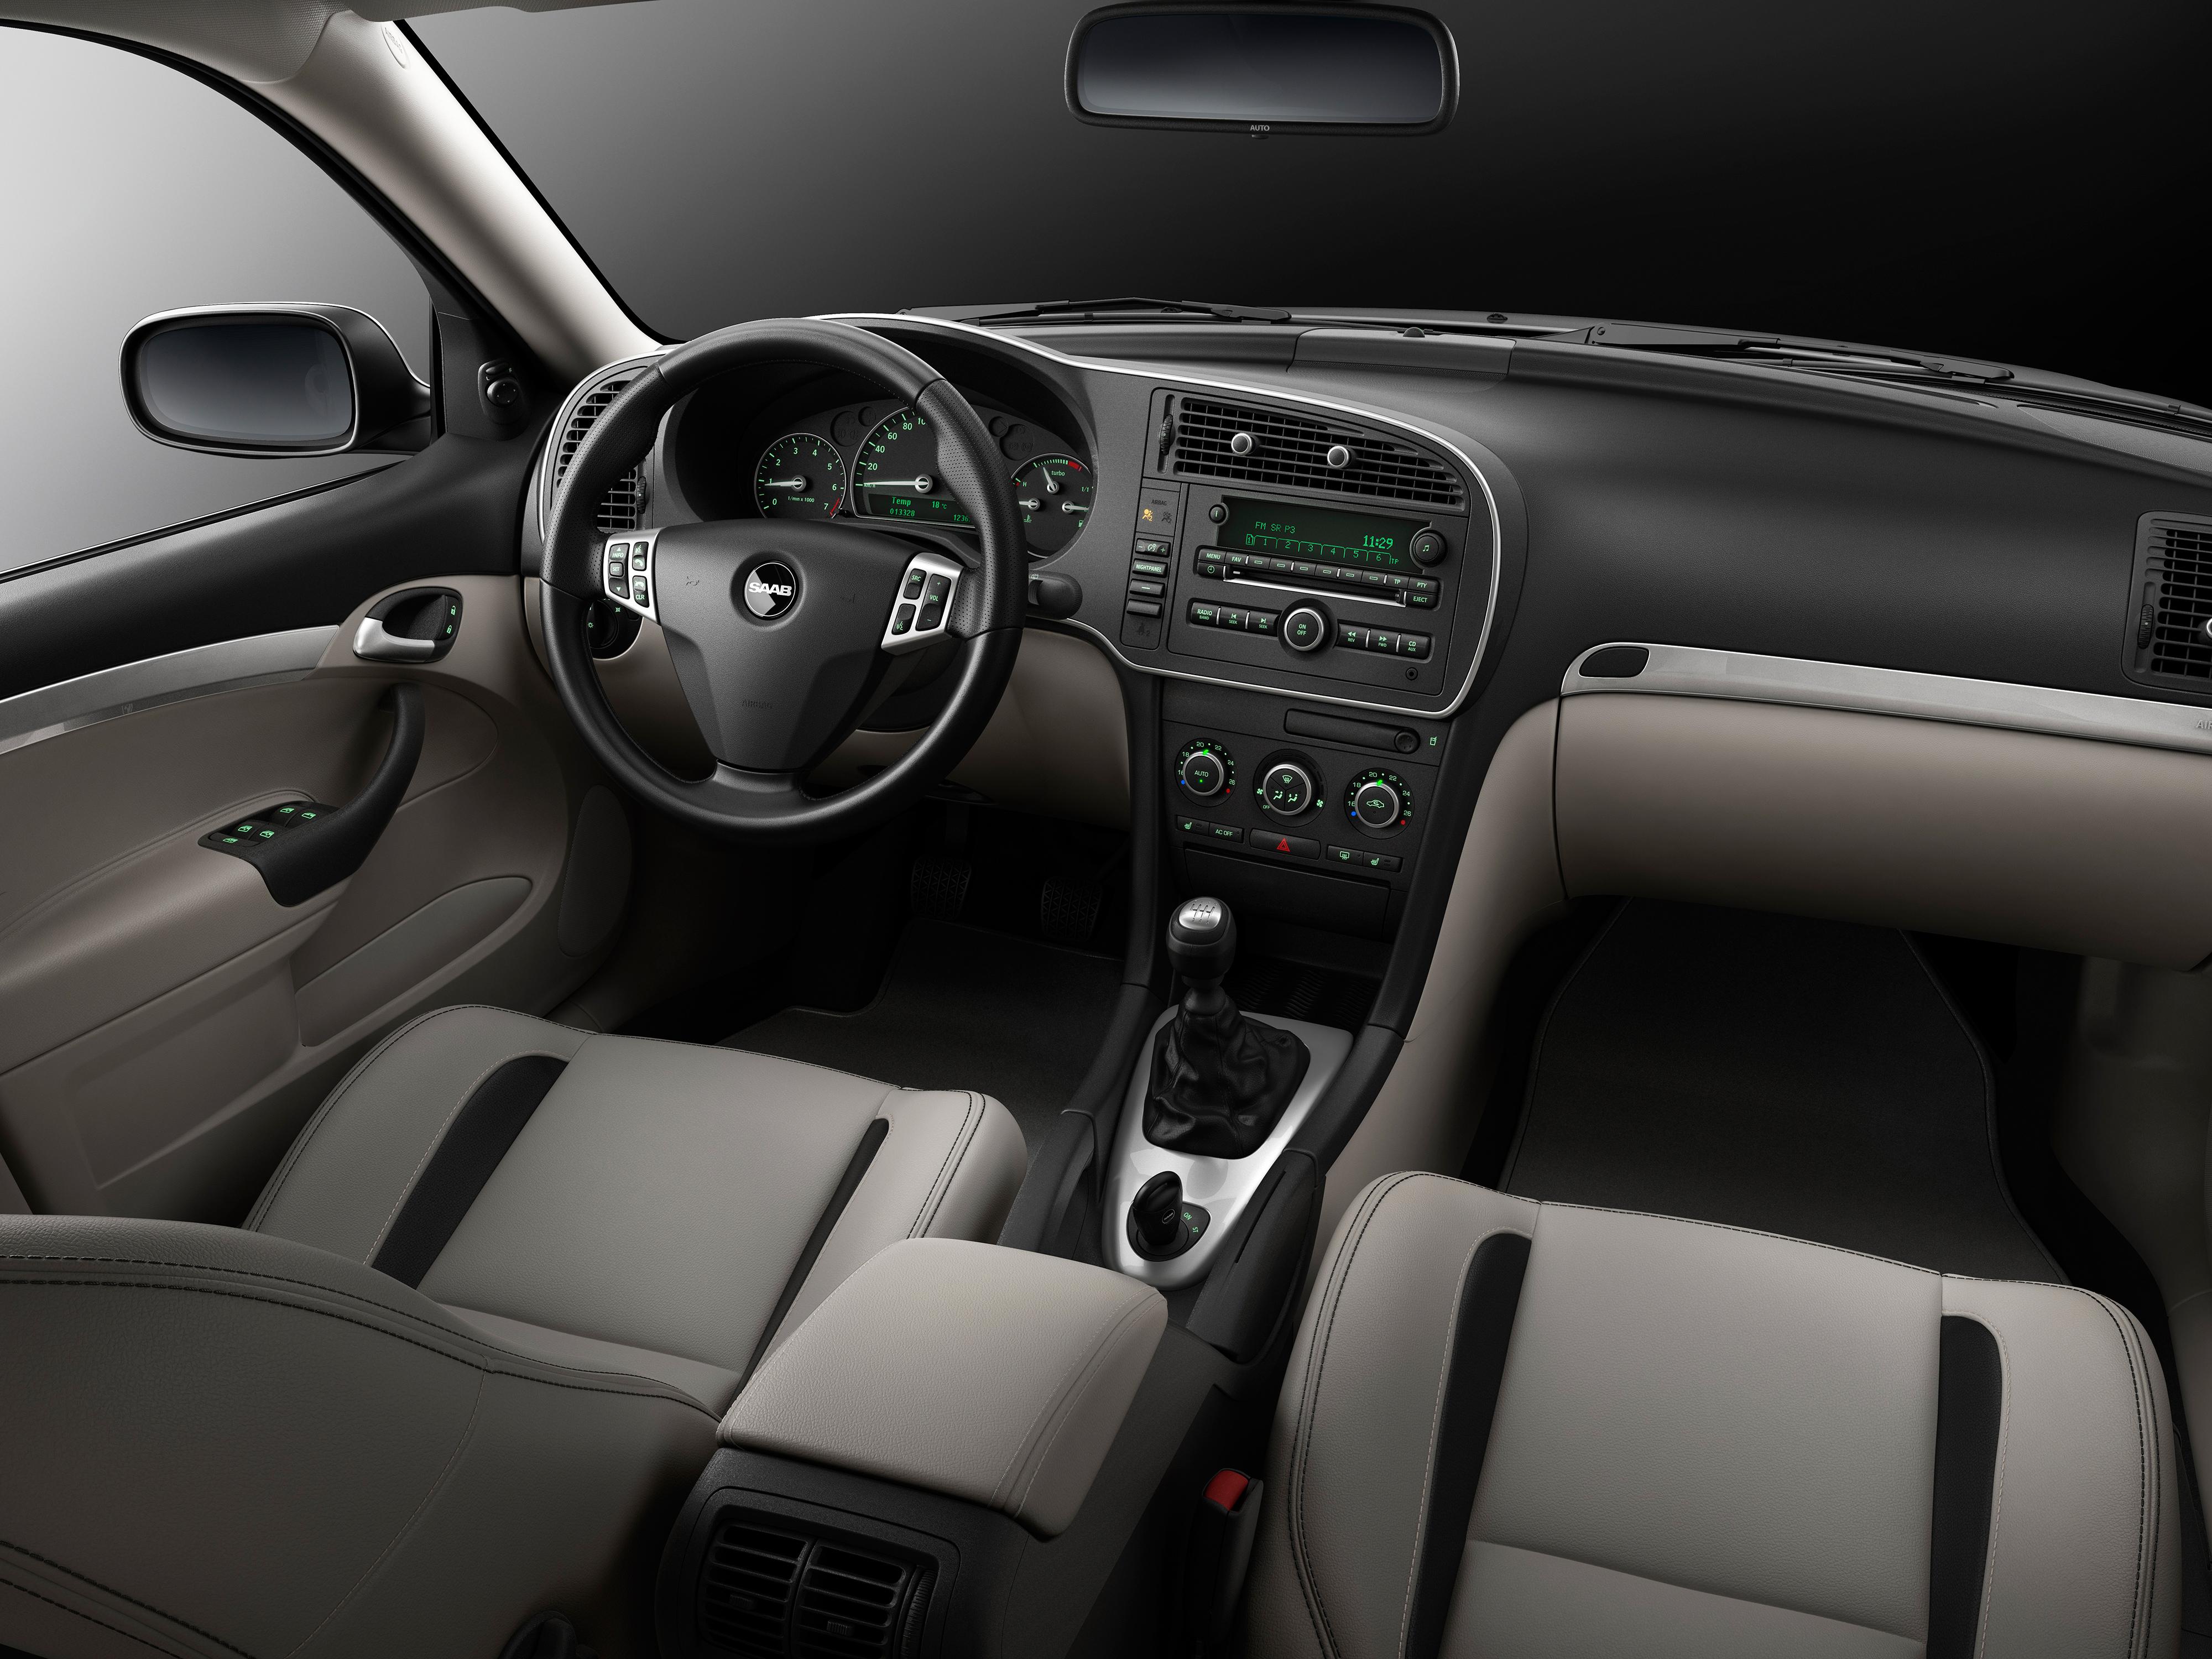 2013 SAAB 9-5 Turbo6 XWD Aero -- 48 HQ Photos -- The Coolest AWD ...